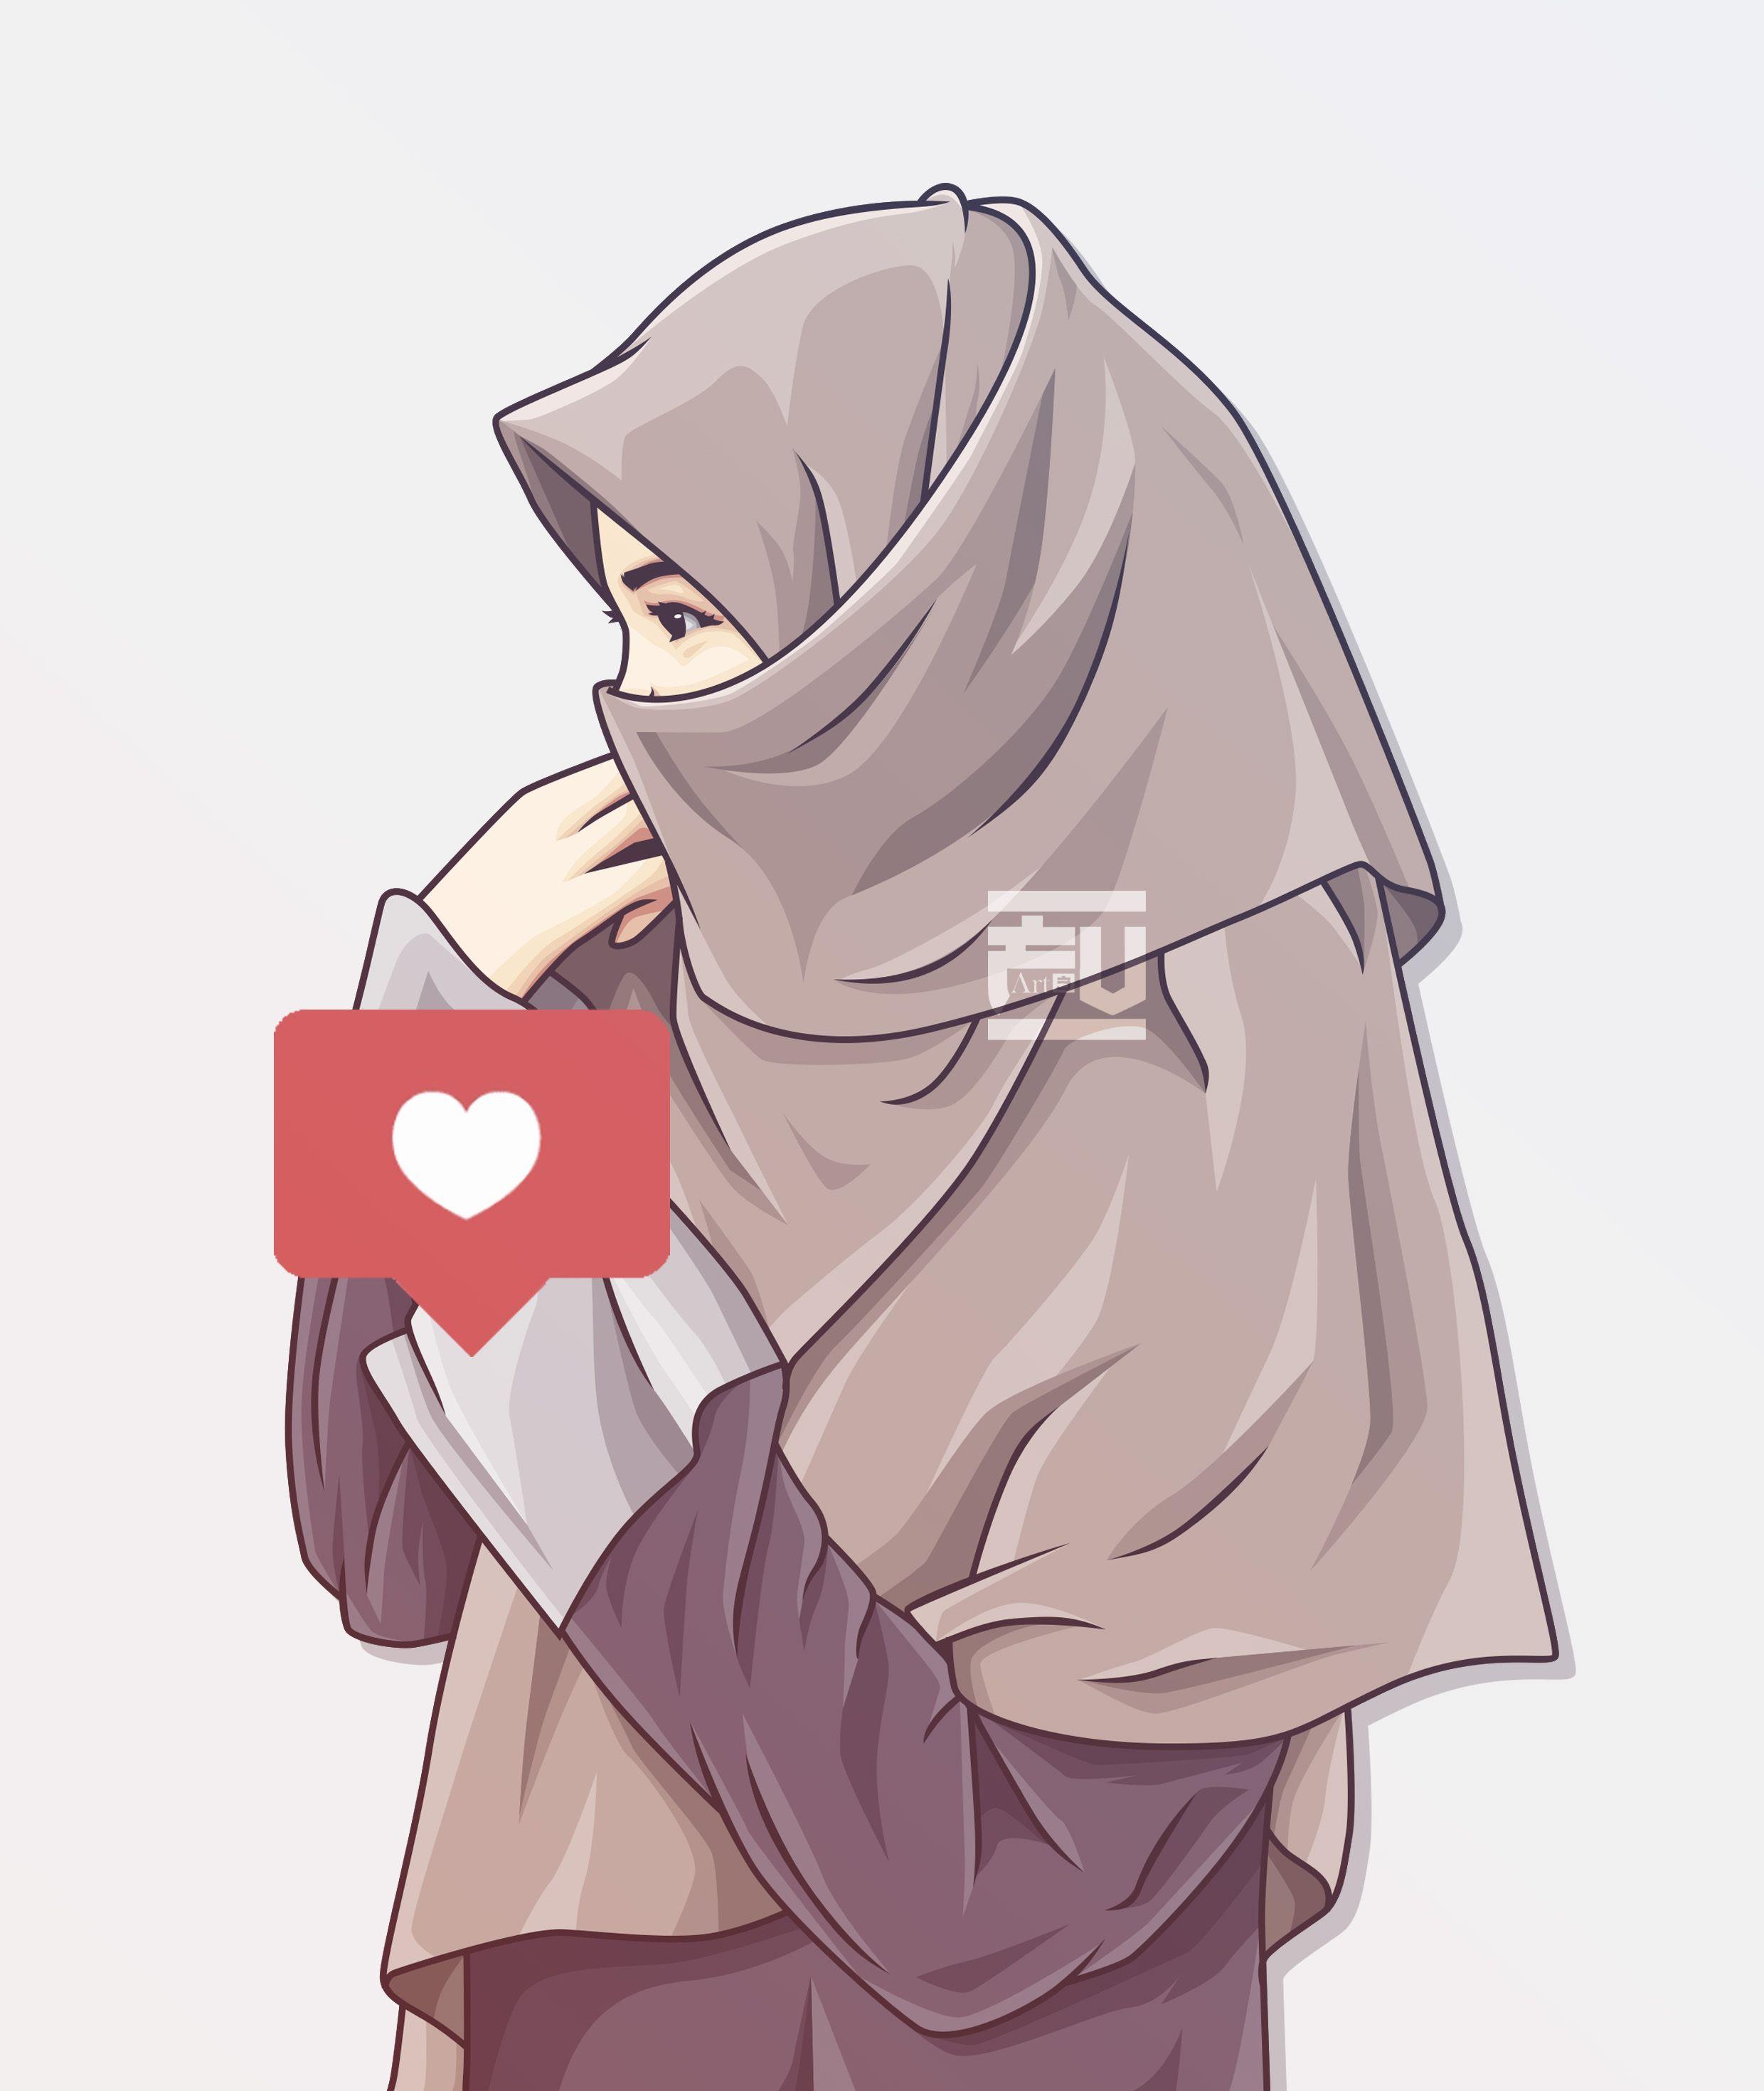 Hijab Vector Ahmadfu22 Gambar Kartun Hijab Seni Islamis